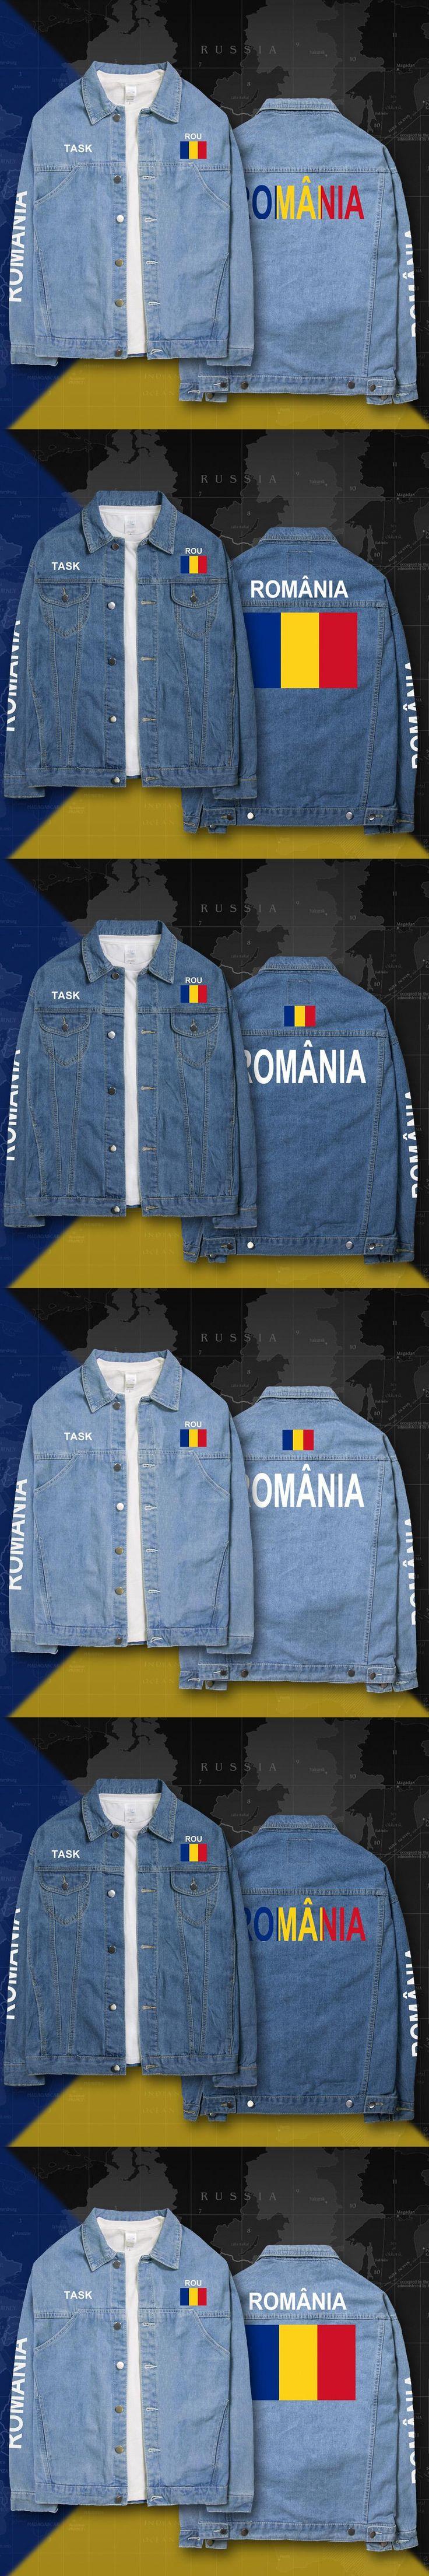 Romania Romanian ROU RO denim jackets men coat men's suits jeans jacket thin jaquetas 2017 sunscreen autumn spring nation flag